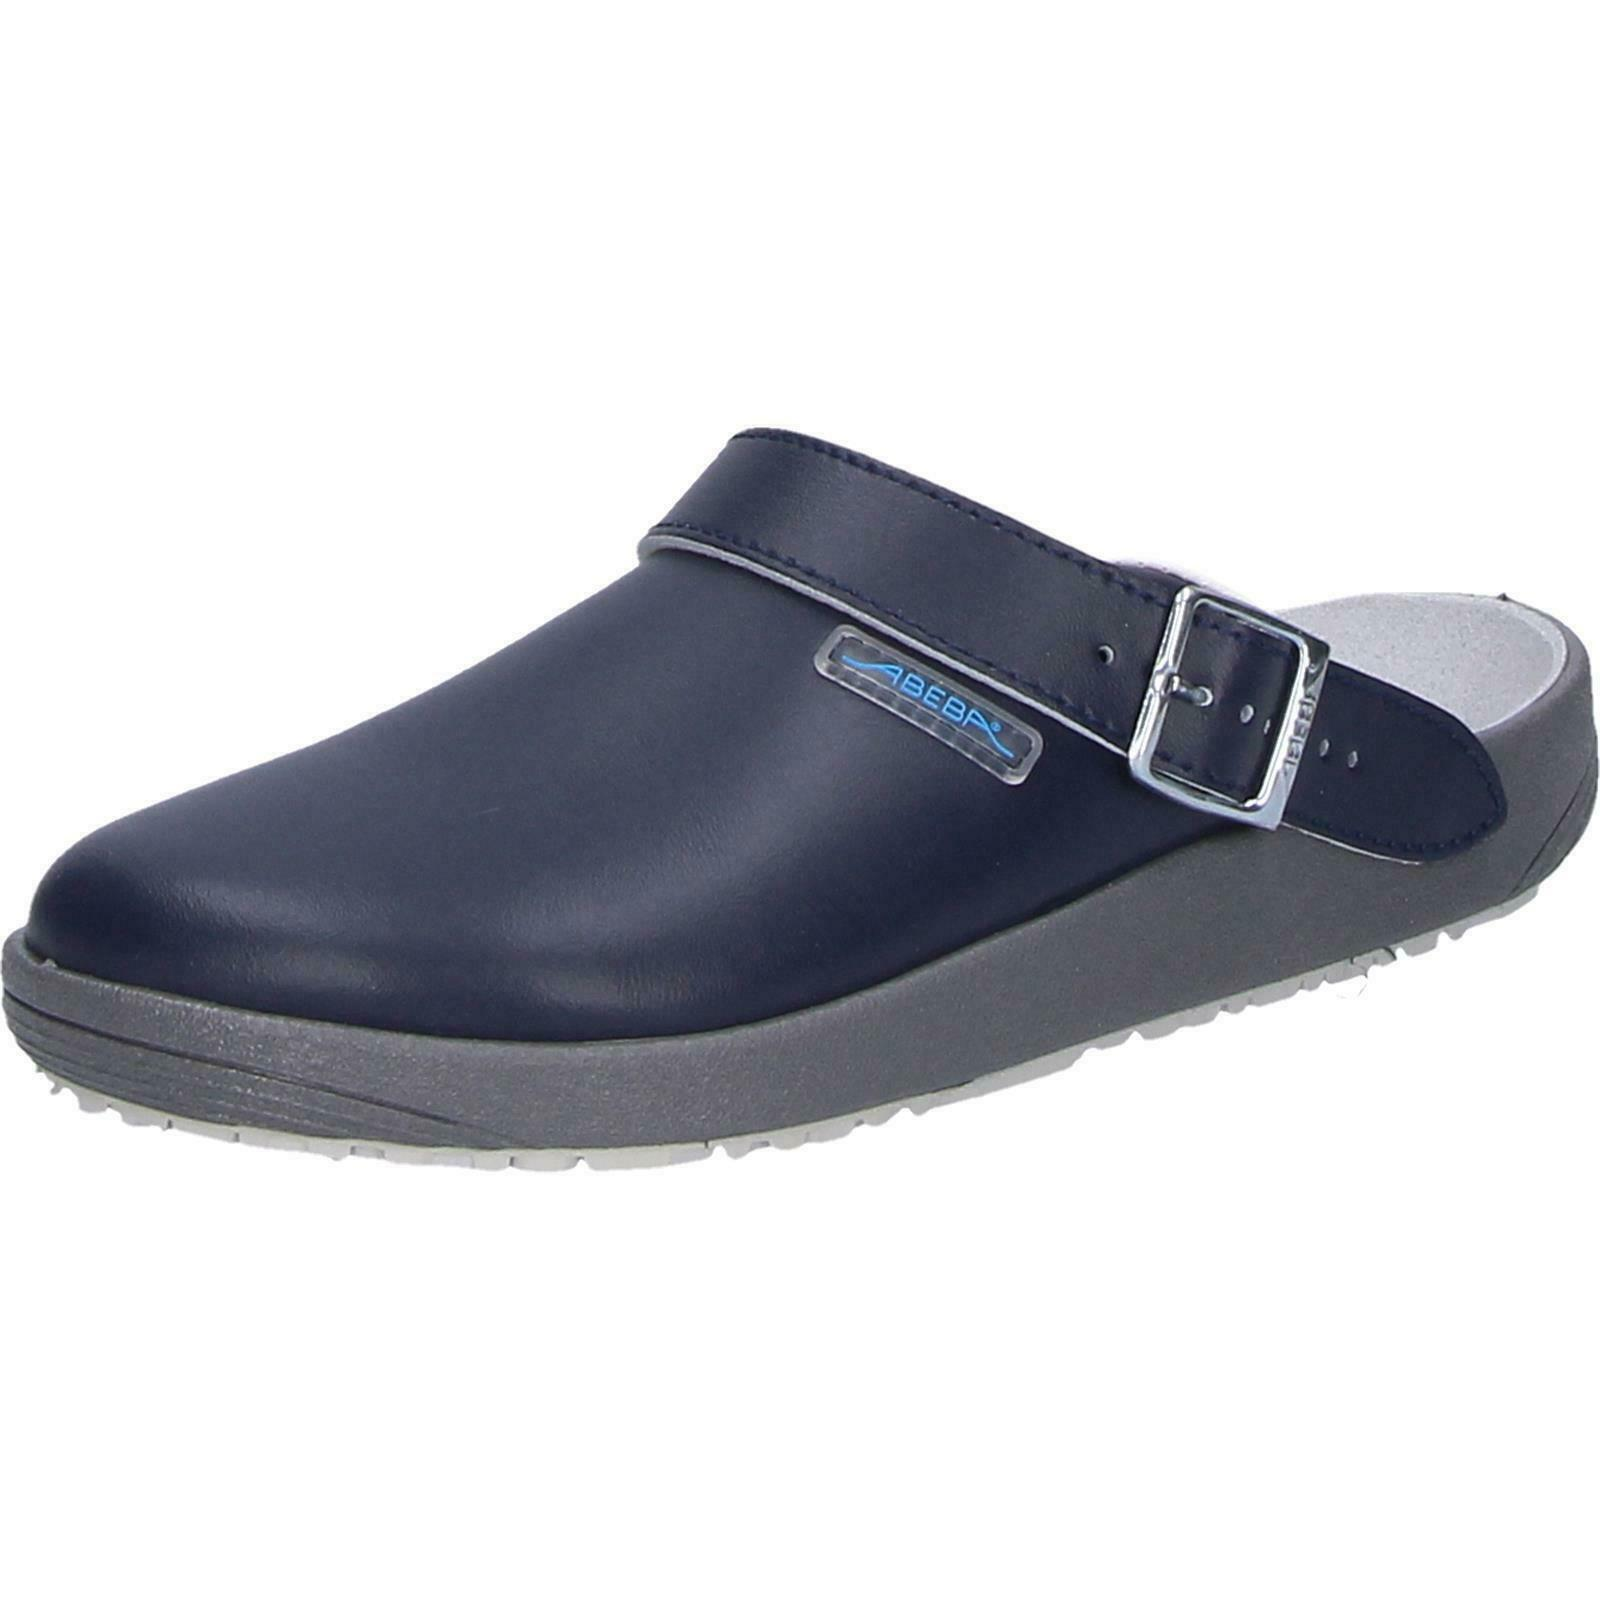 Abeba zapatos Marine d + H. sandalia es talla 40